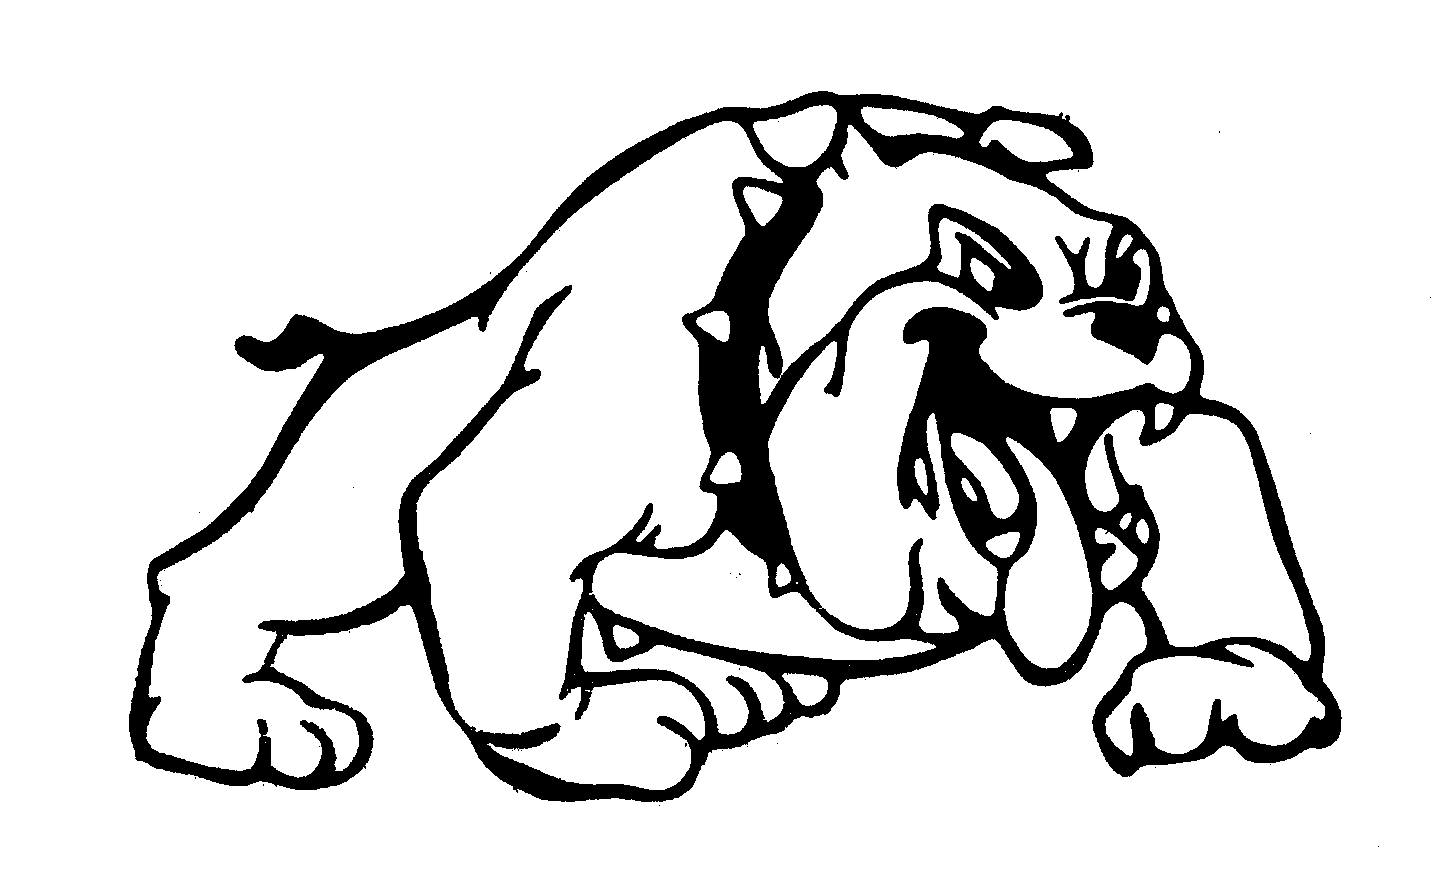 Bulldog images clip art - .